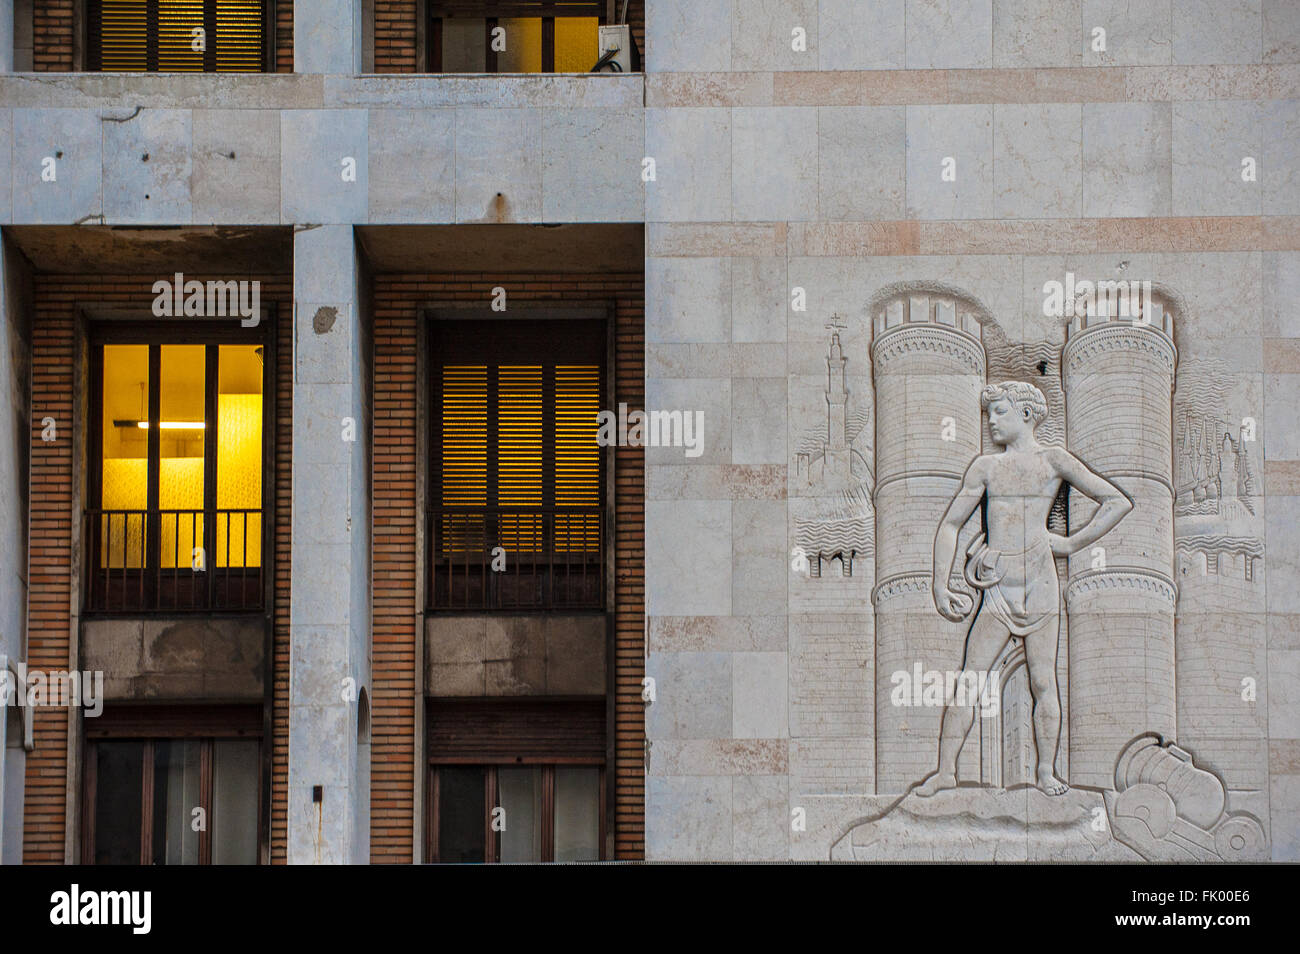 Italy Liguria Genoa Architectures by Marcello Piacentini Piacentini Tower - Stock Image